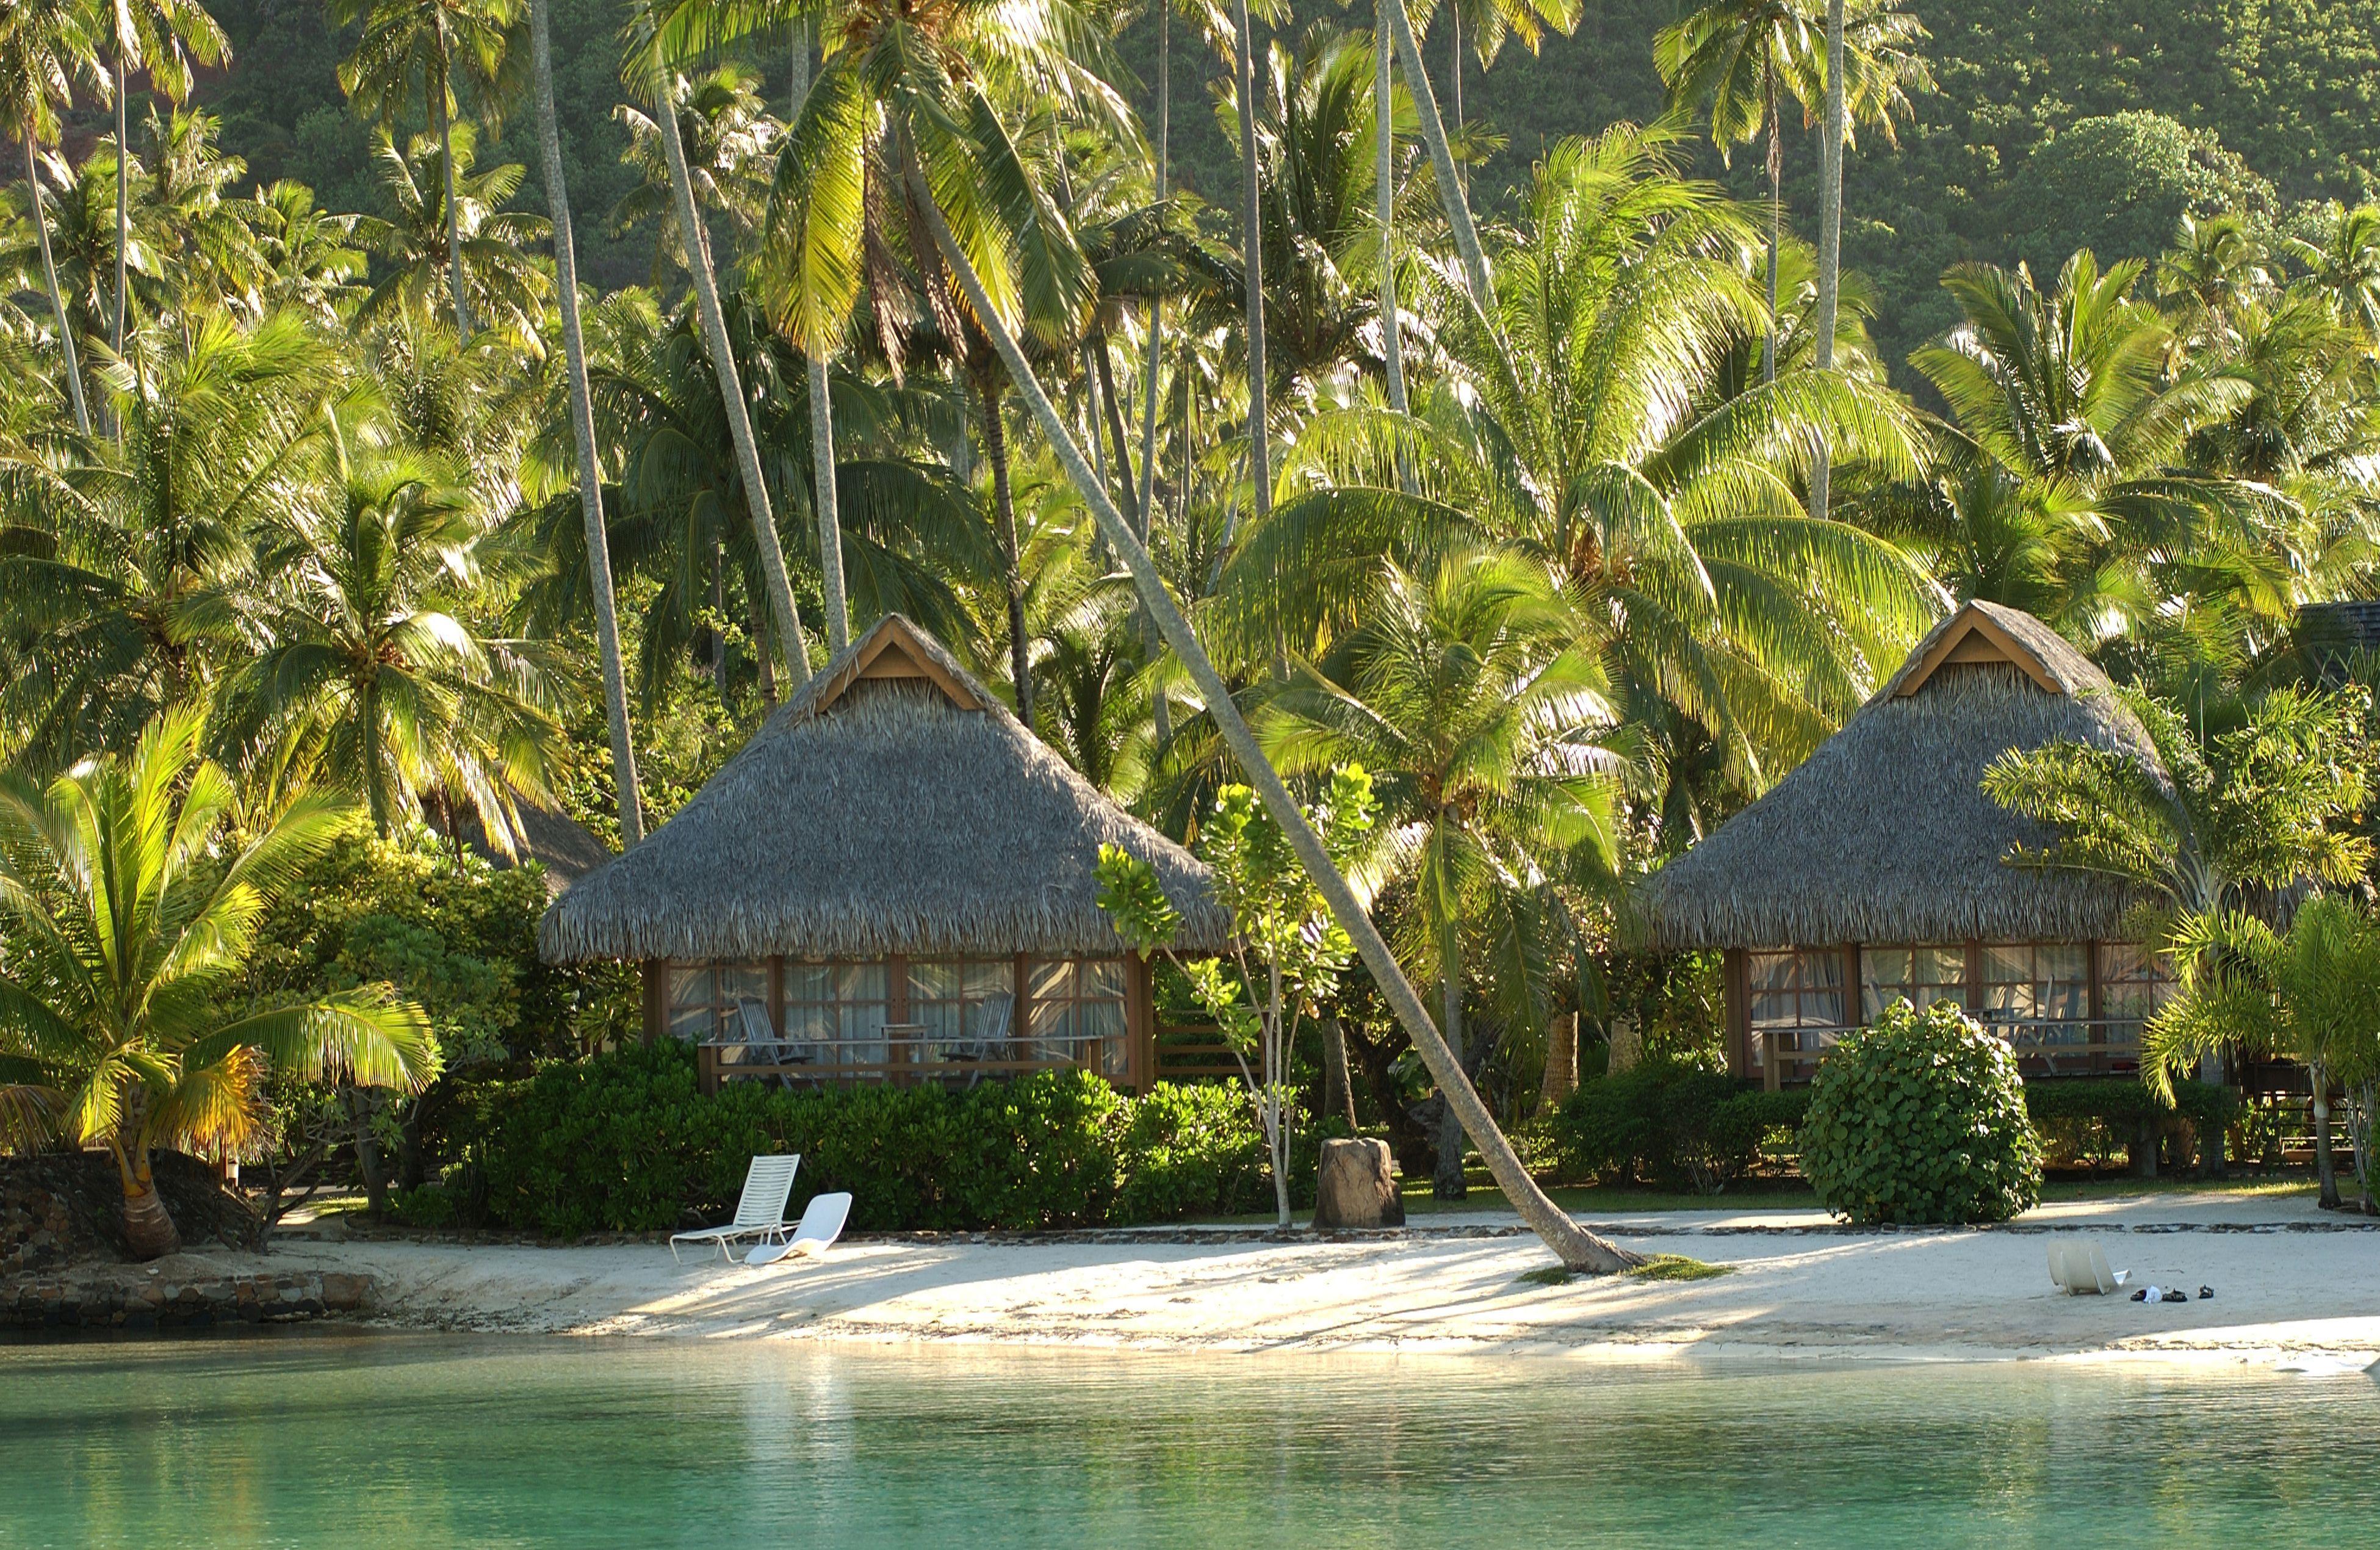 Beach Bungalow in Tahiti